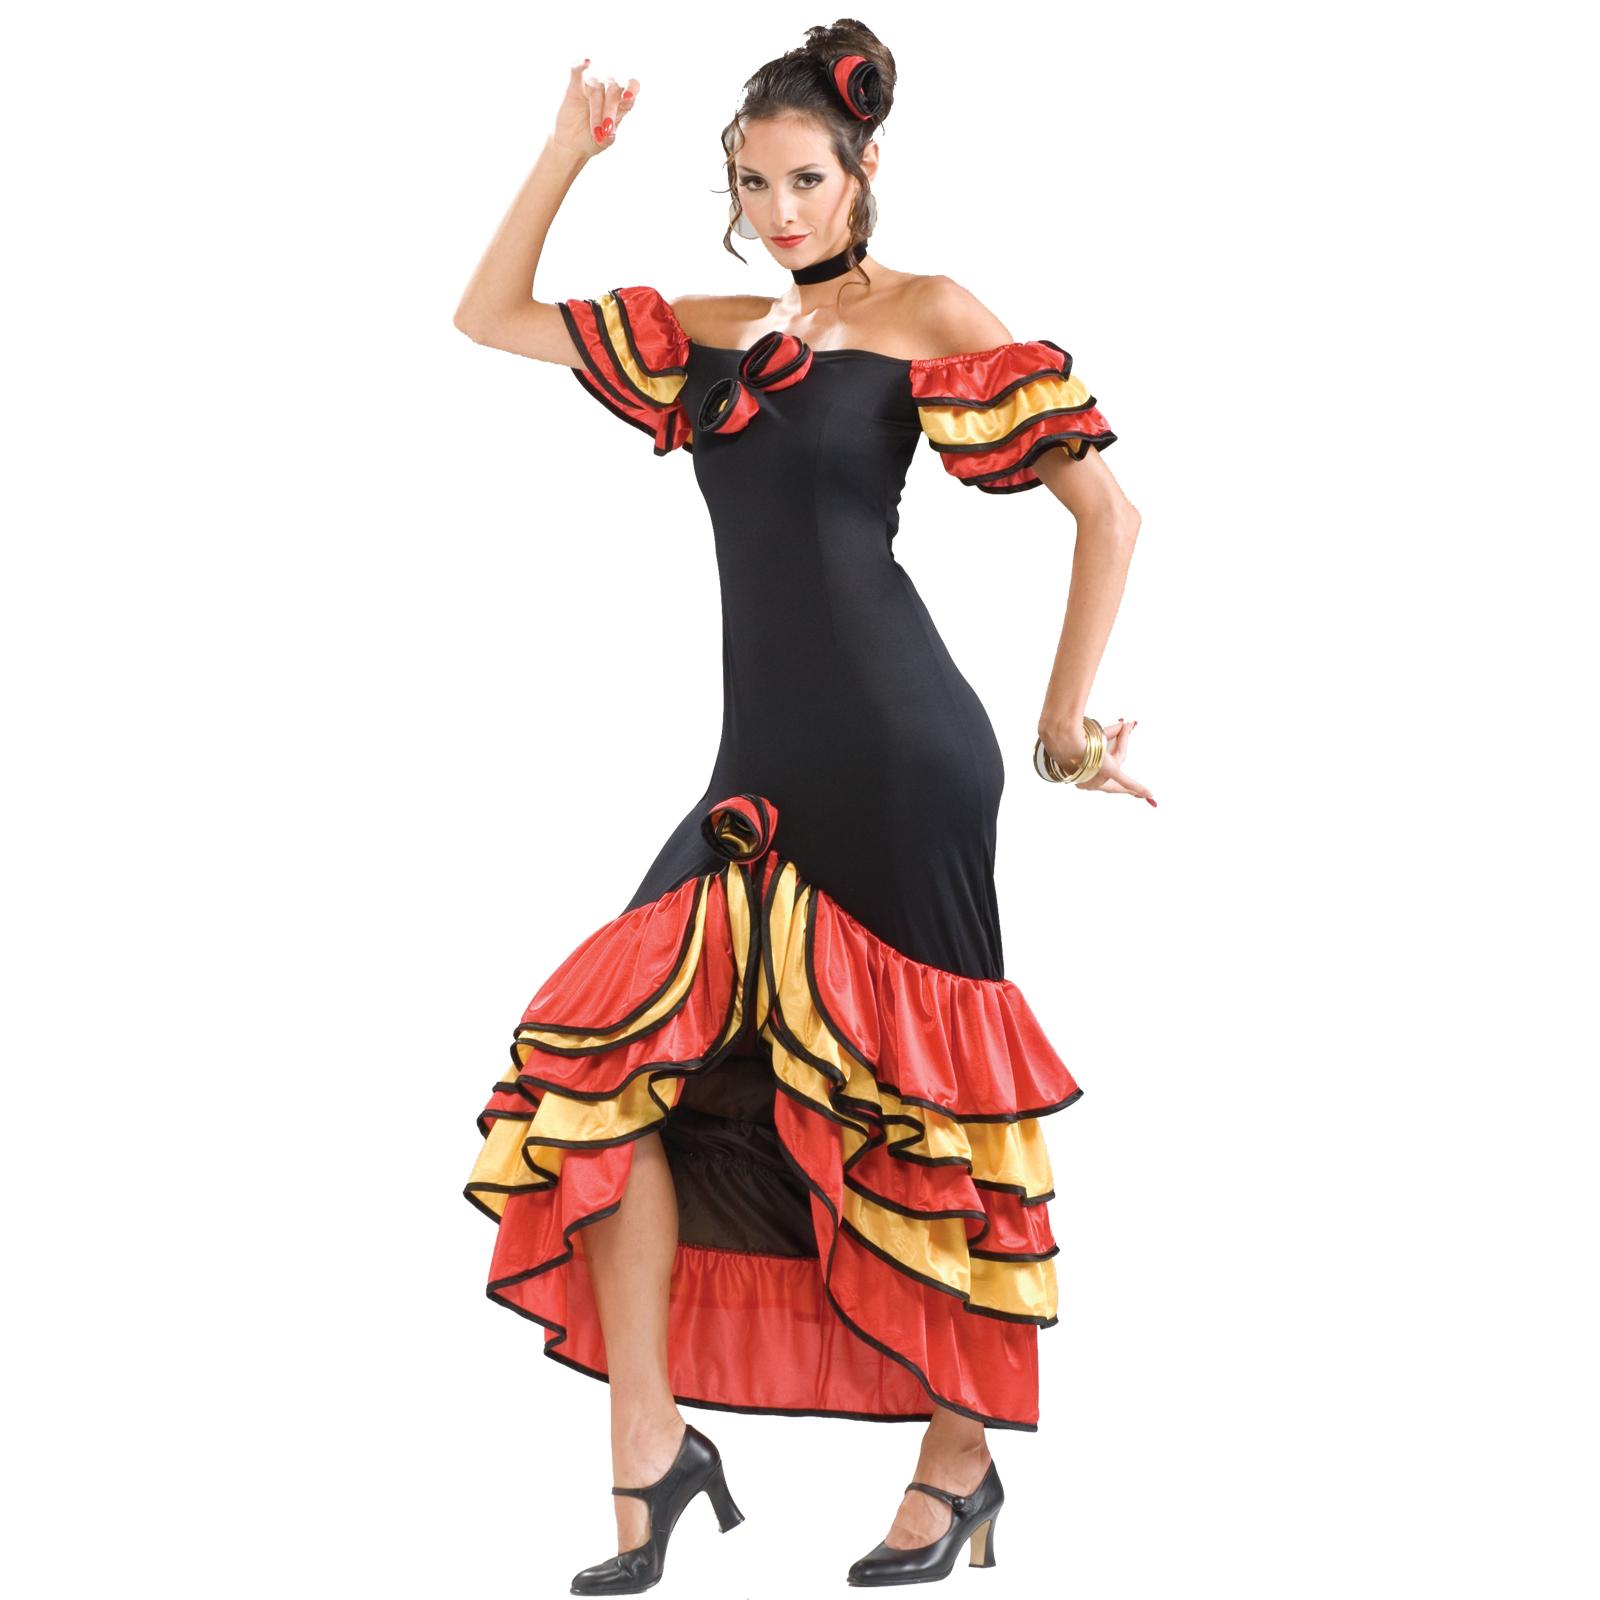 Women\u0027s Flamenco Dancer Costume